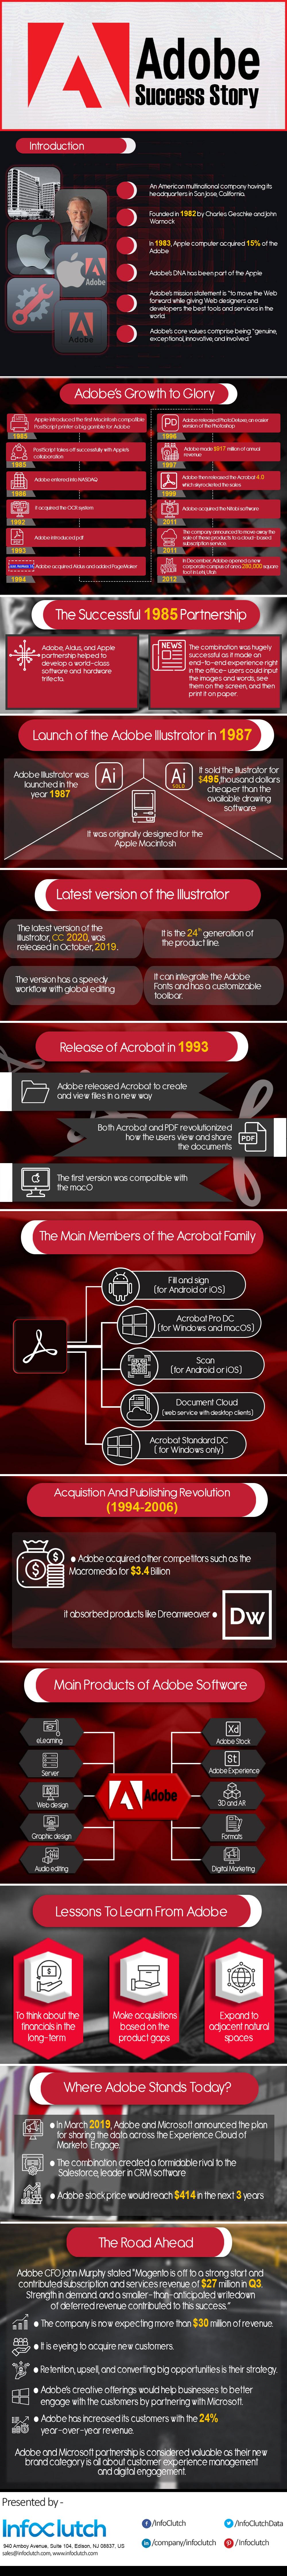 Adobe Success Story by Infoclutch